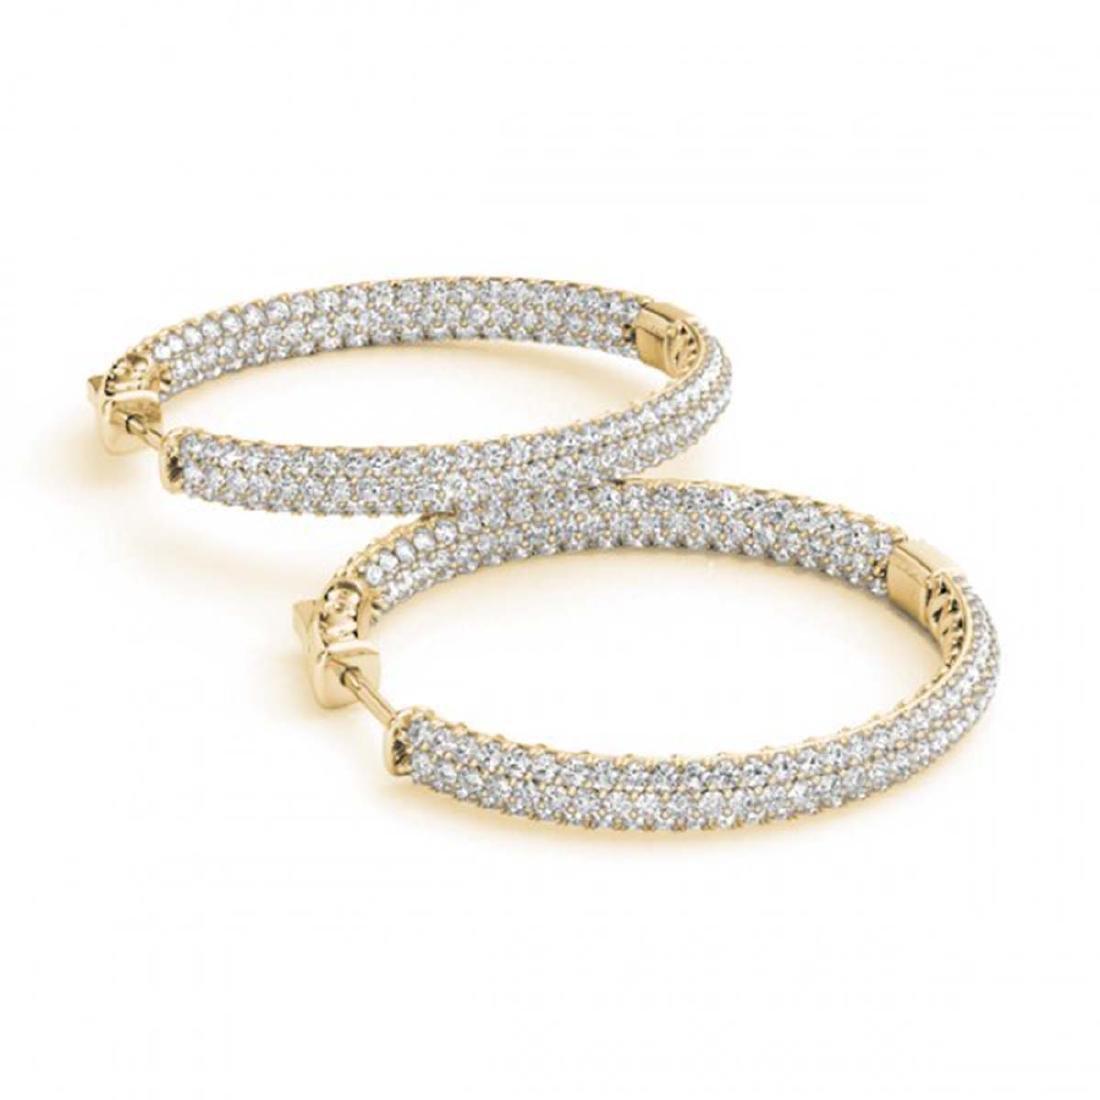 2.5 CTW Diamond VS/SI 25 Mm Hoop Earrings 14K Pave Gold